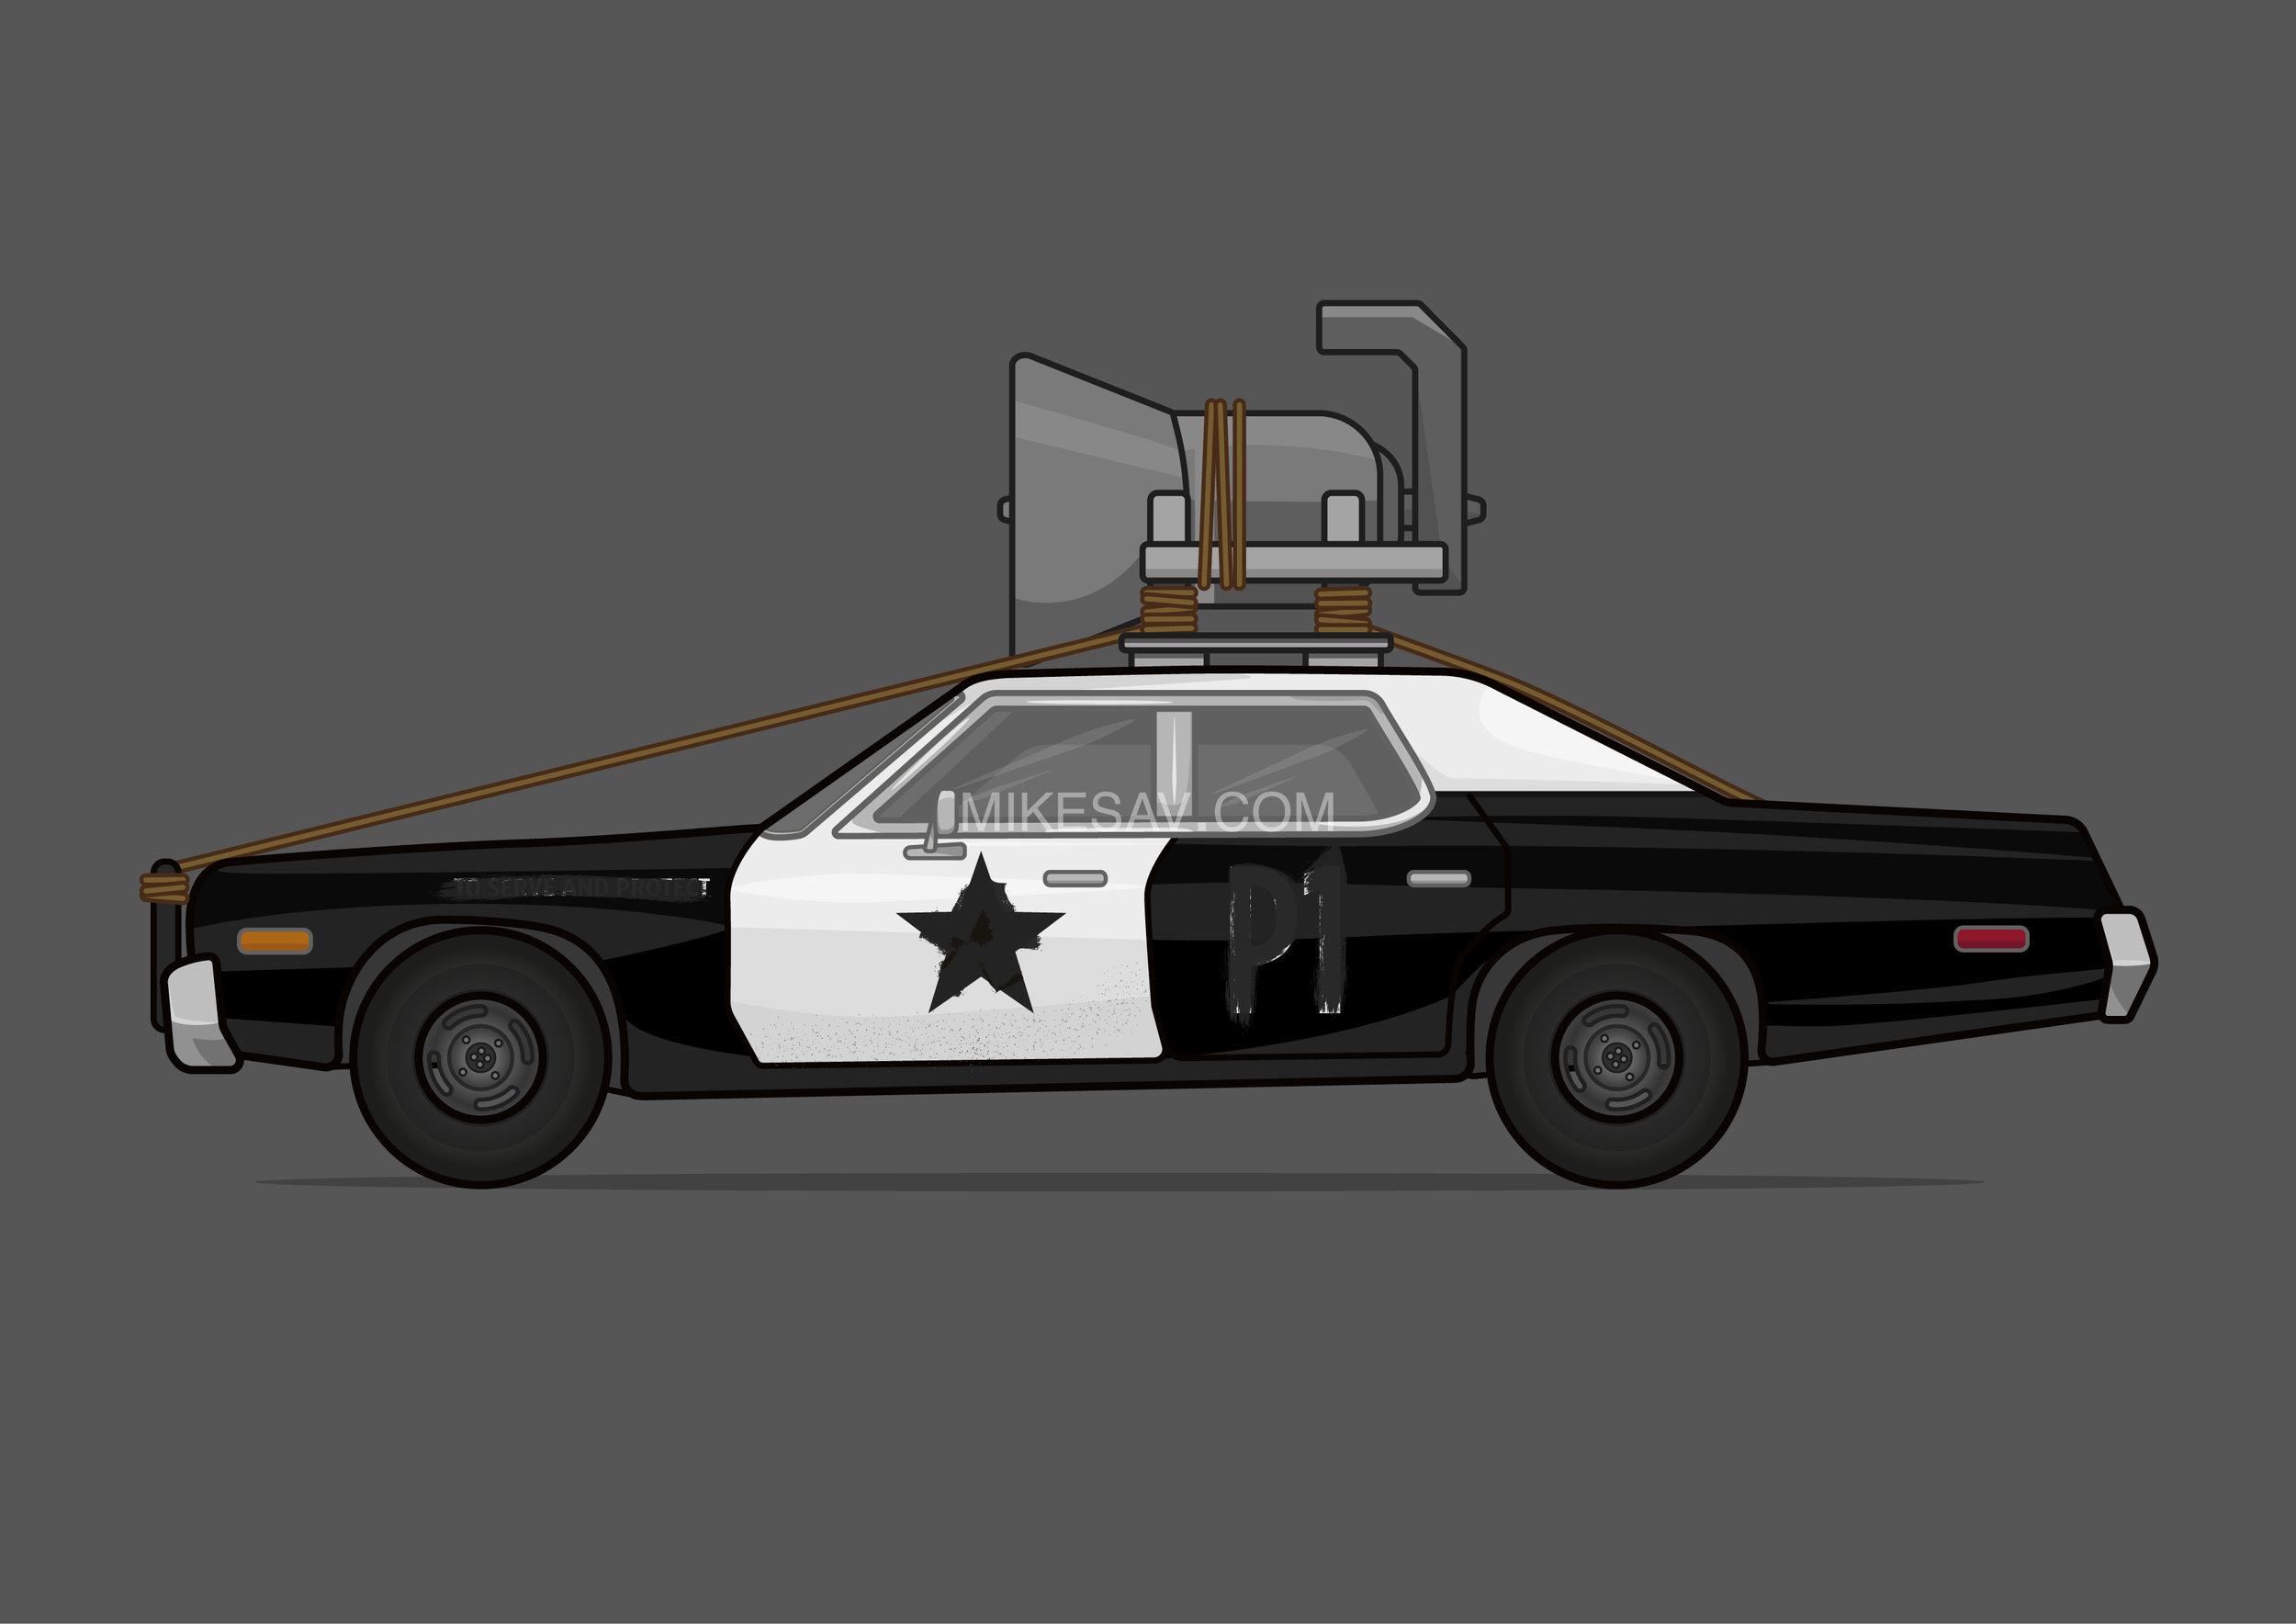 Dodge Monaco (Bluesmobile) / The Blues Brothers (1980) / Director: John Landis